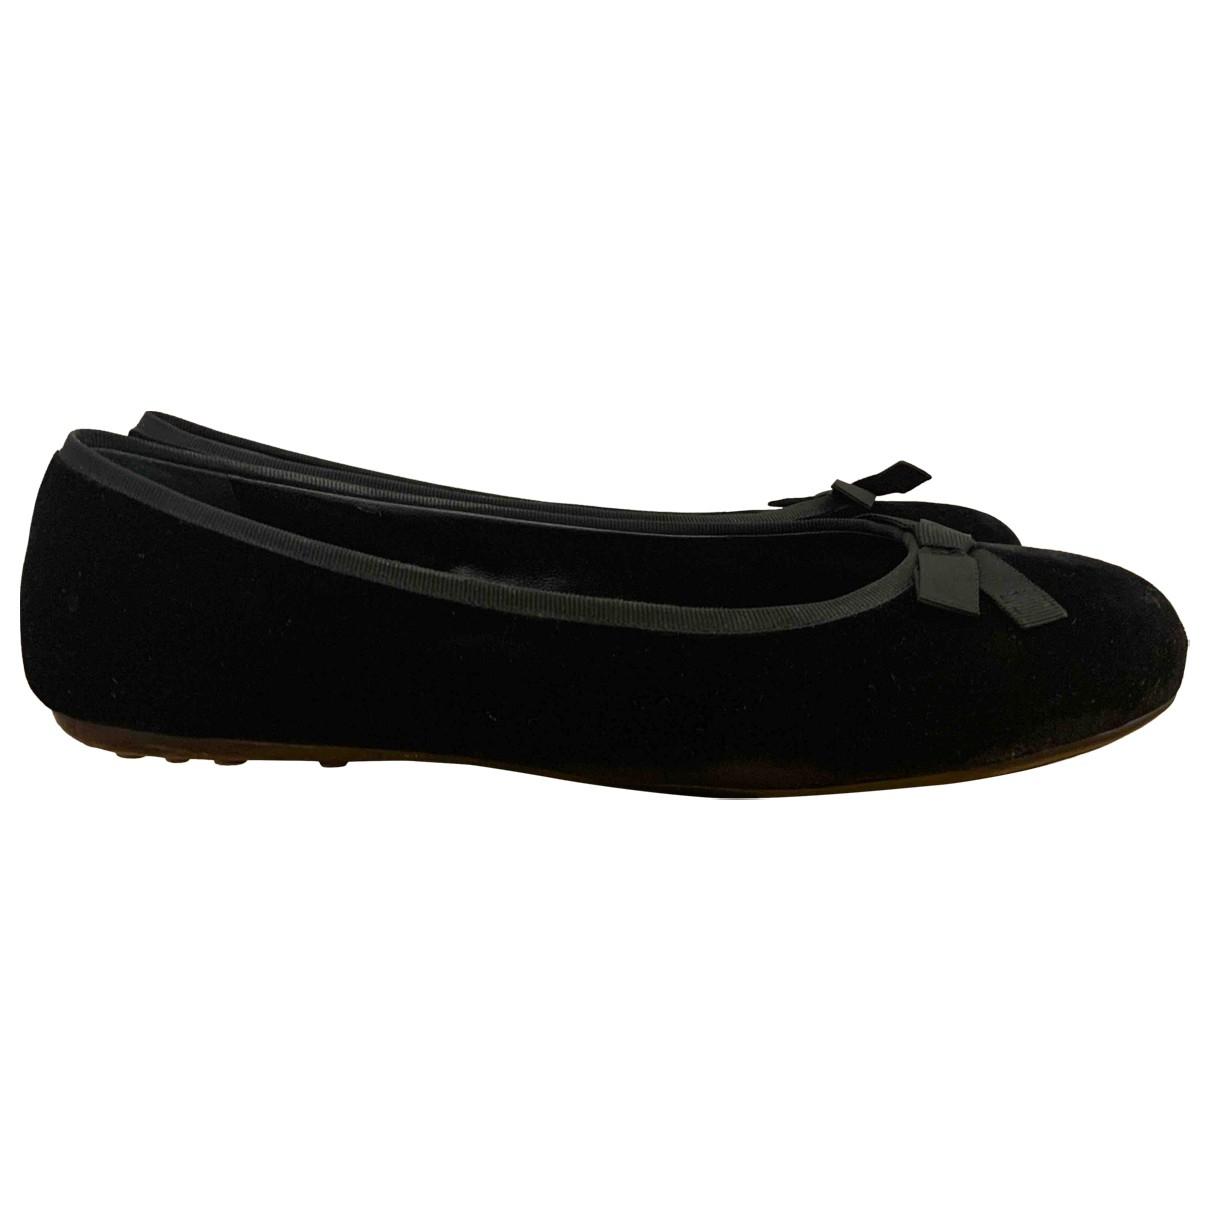 Carshoe - Ballerines   pour femme en velours - noir